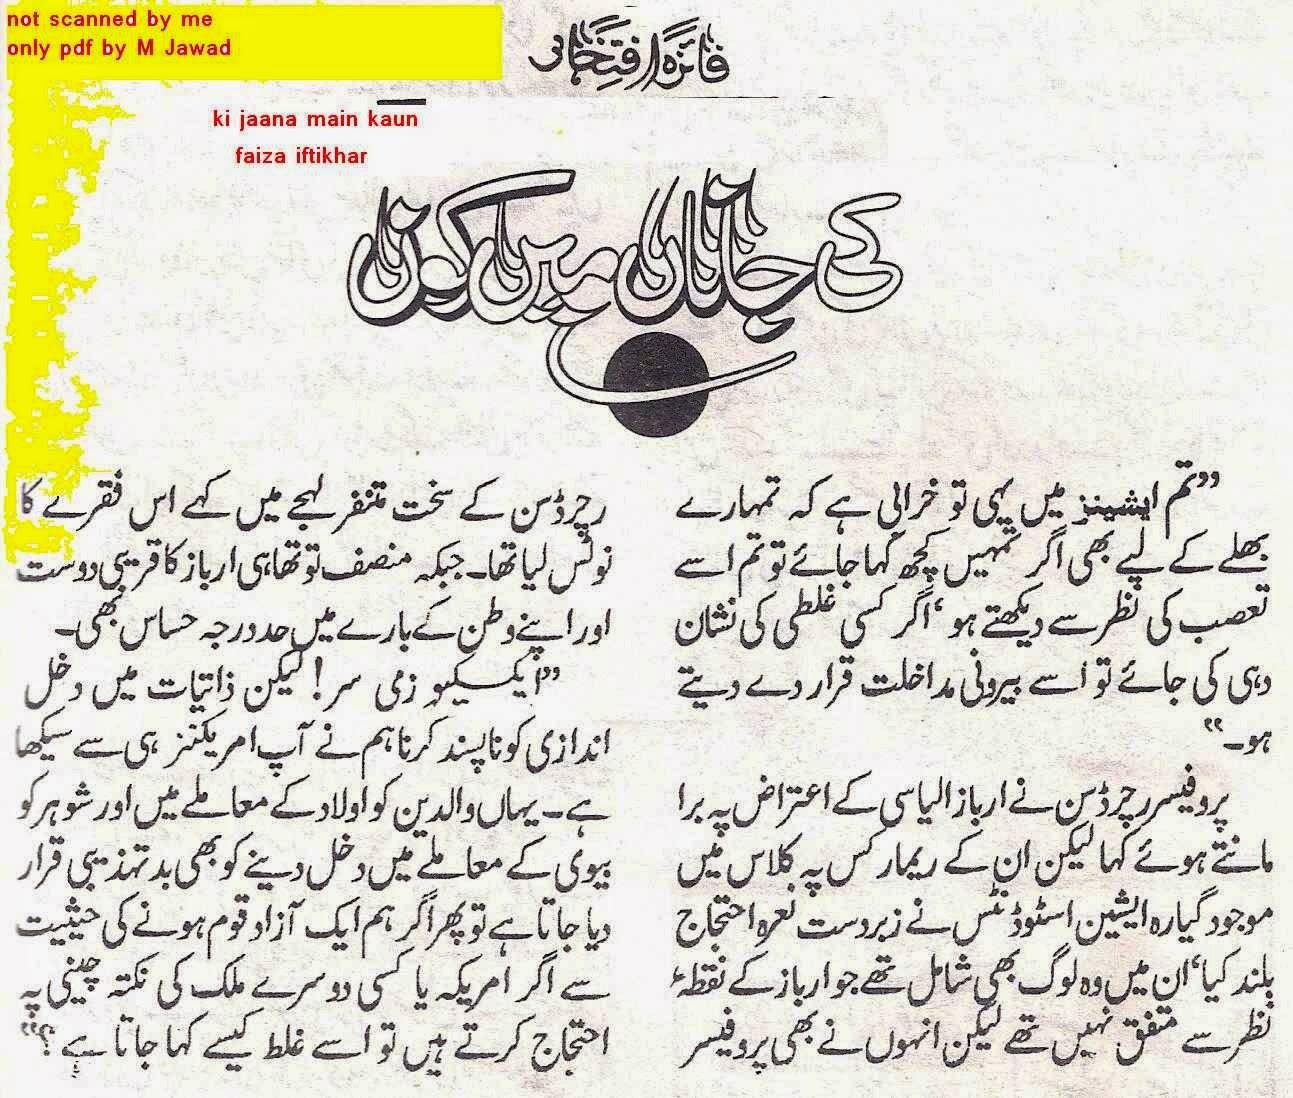 Ki Jaana Main Kaun by Faiza Iftikhar p1 1 - Ki Jaana main kaun by faiza iftikhar